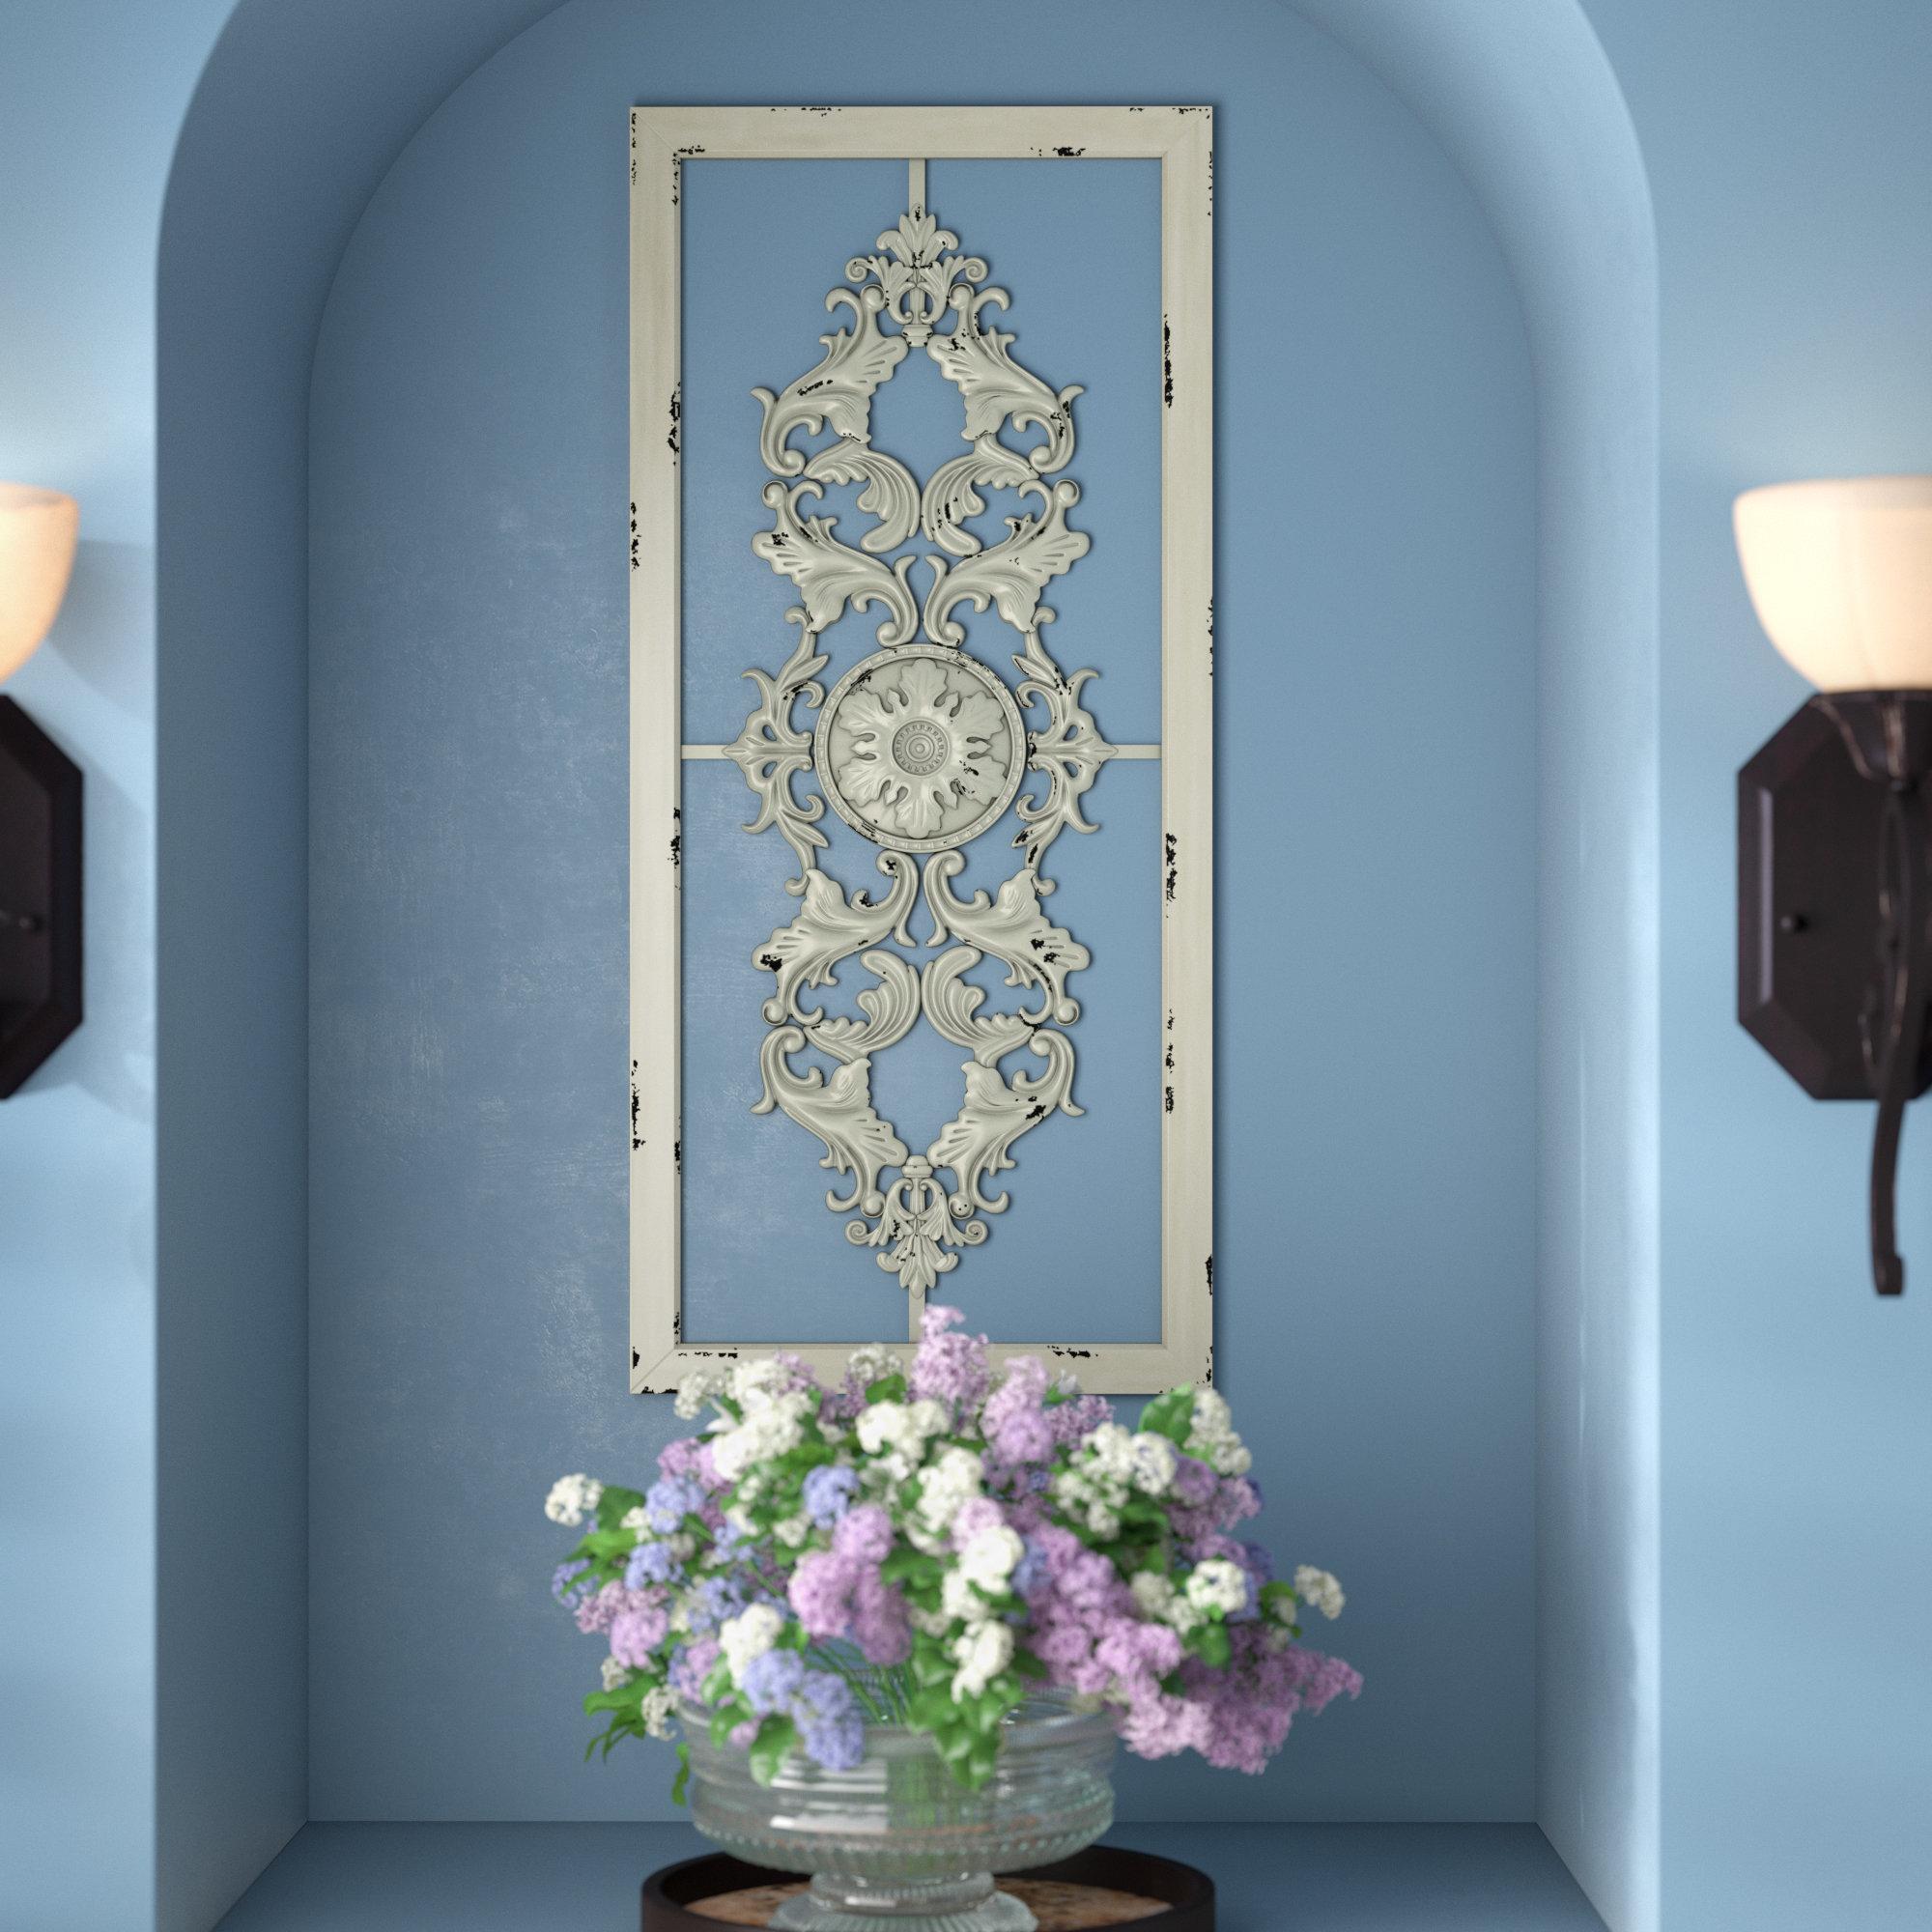 Fleur De Lis Living Scroll Panel Wall Décor & Reviews | Wayfair With Scroll Panel Wall Decor (View 2 of 30)